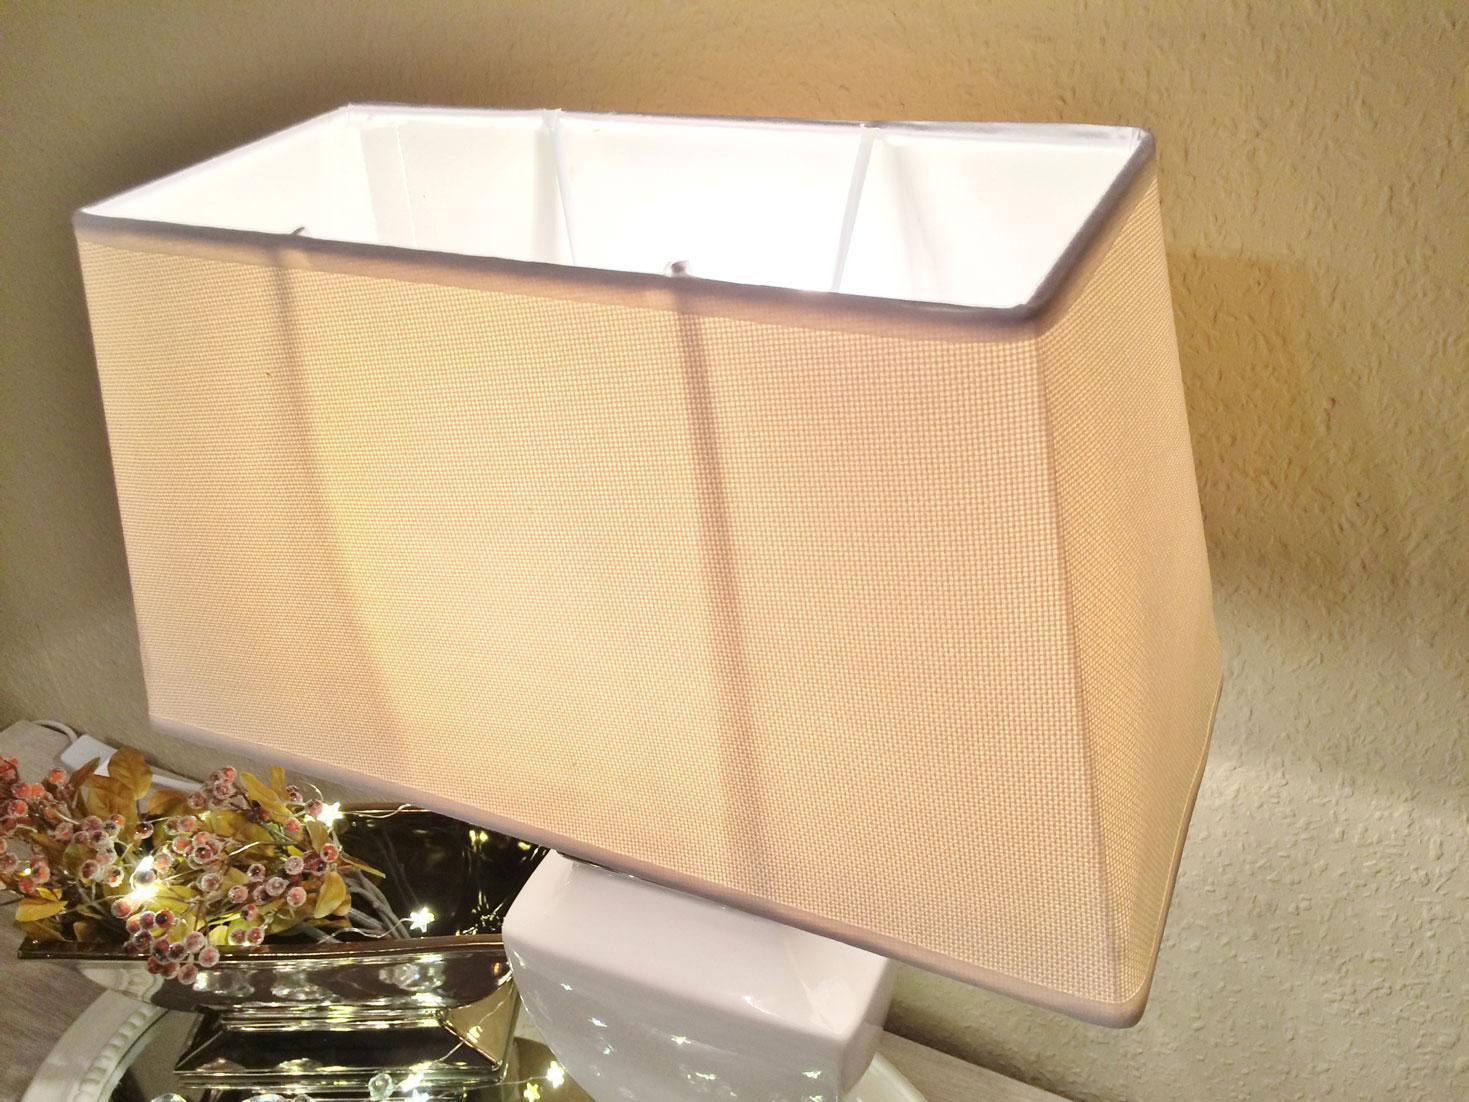 estrelle keramik lampe 36cm lampenfu lampenschirm wei nachttischlampe shabby. Black Bedroom Furniture Sets. Home Design Ideas